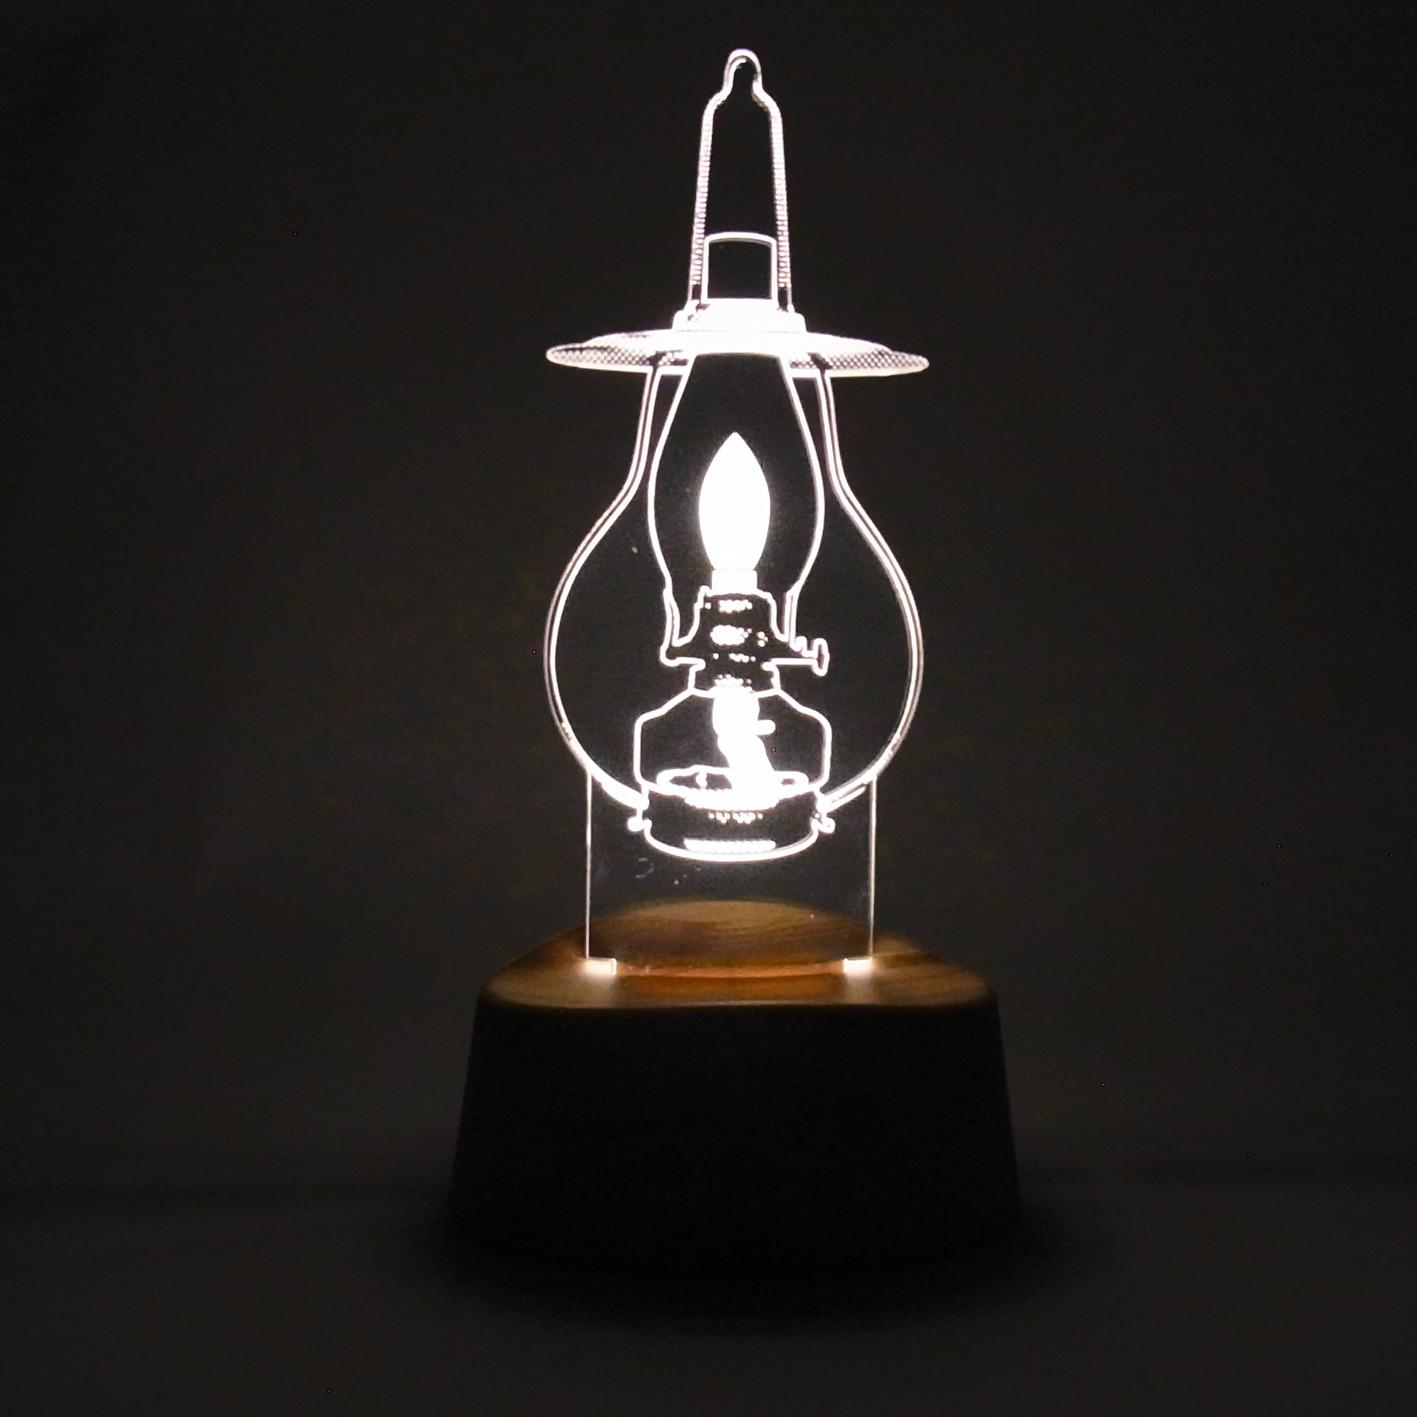 LEDアクリルスタンドライト【吊りランプ】 (ART-AKARI-05)